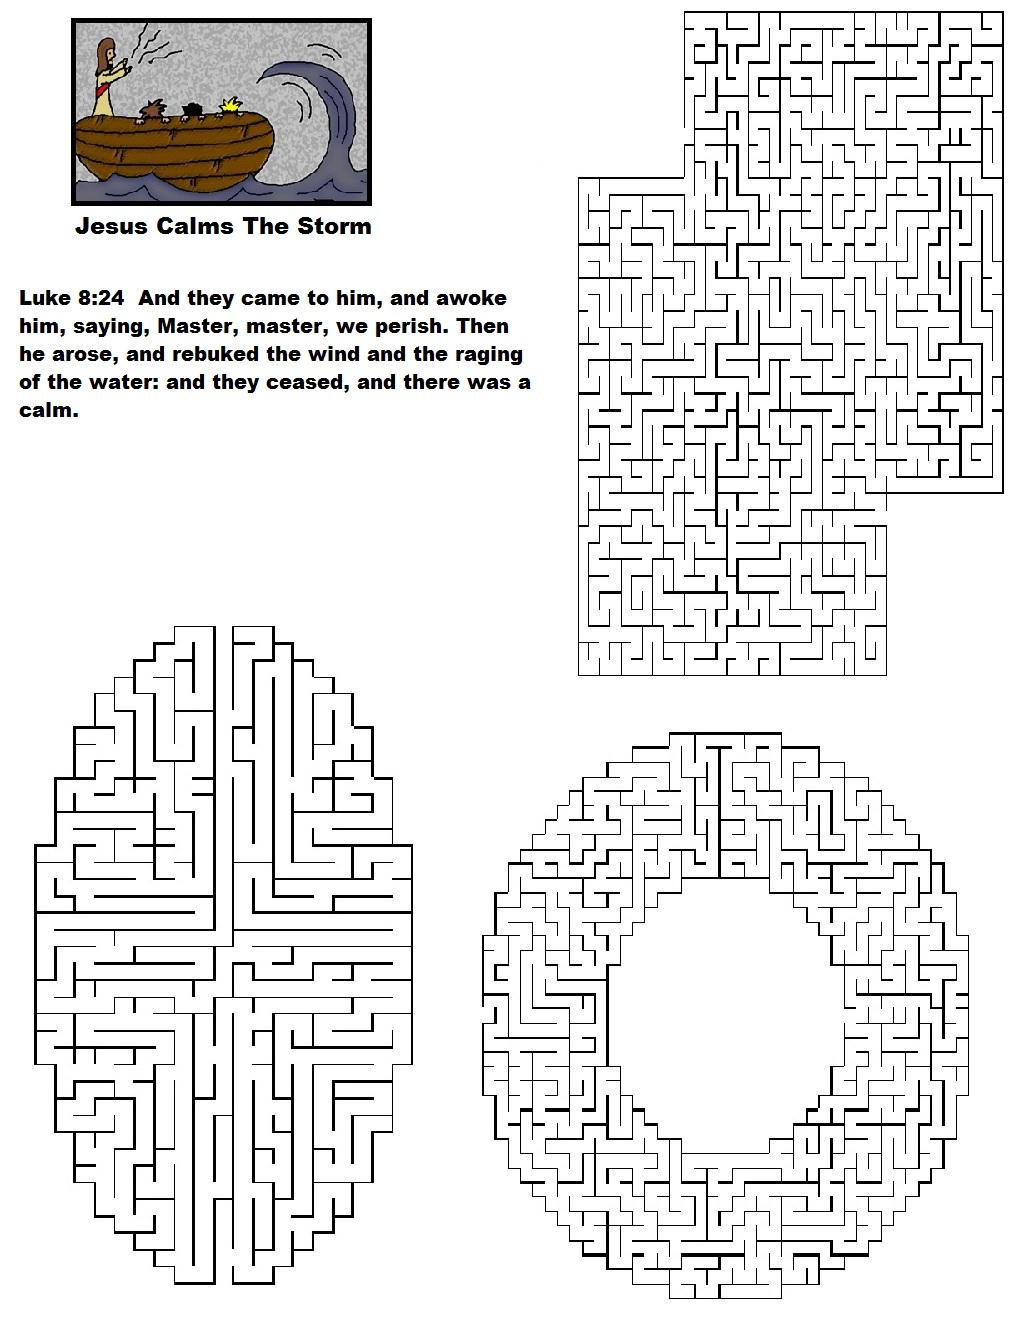 Free coloring pages jesus calms the storm - Jesus Calms The Storm Maze